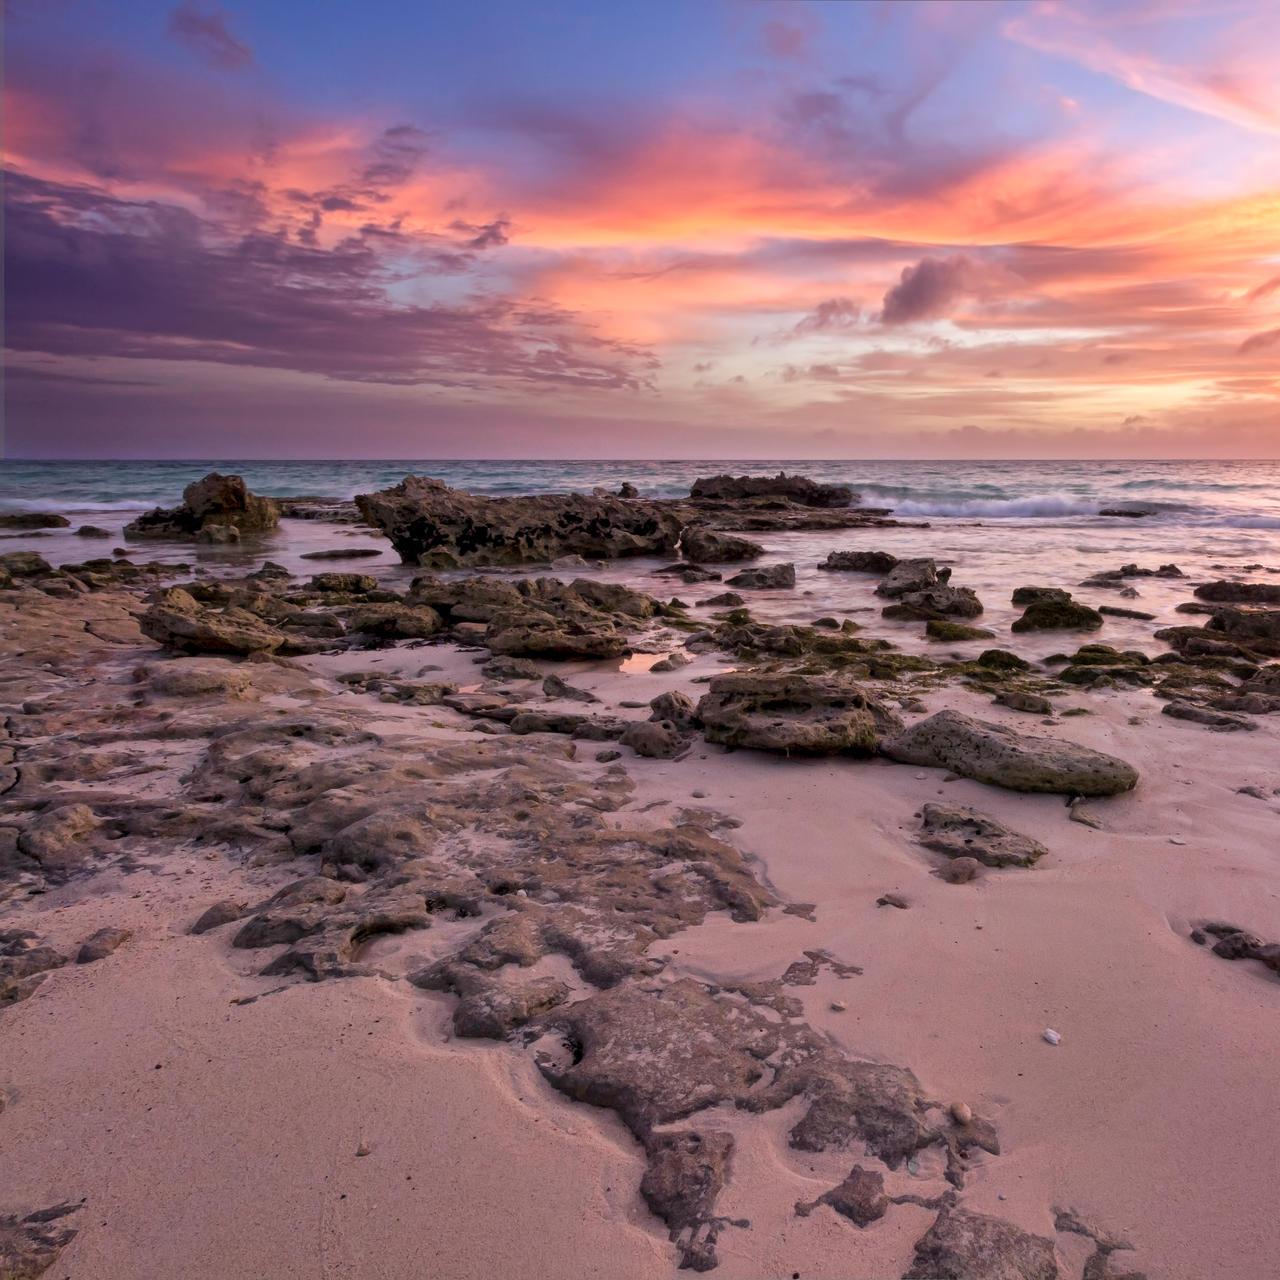 January sunset 2 by peterpateman